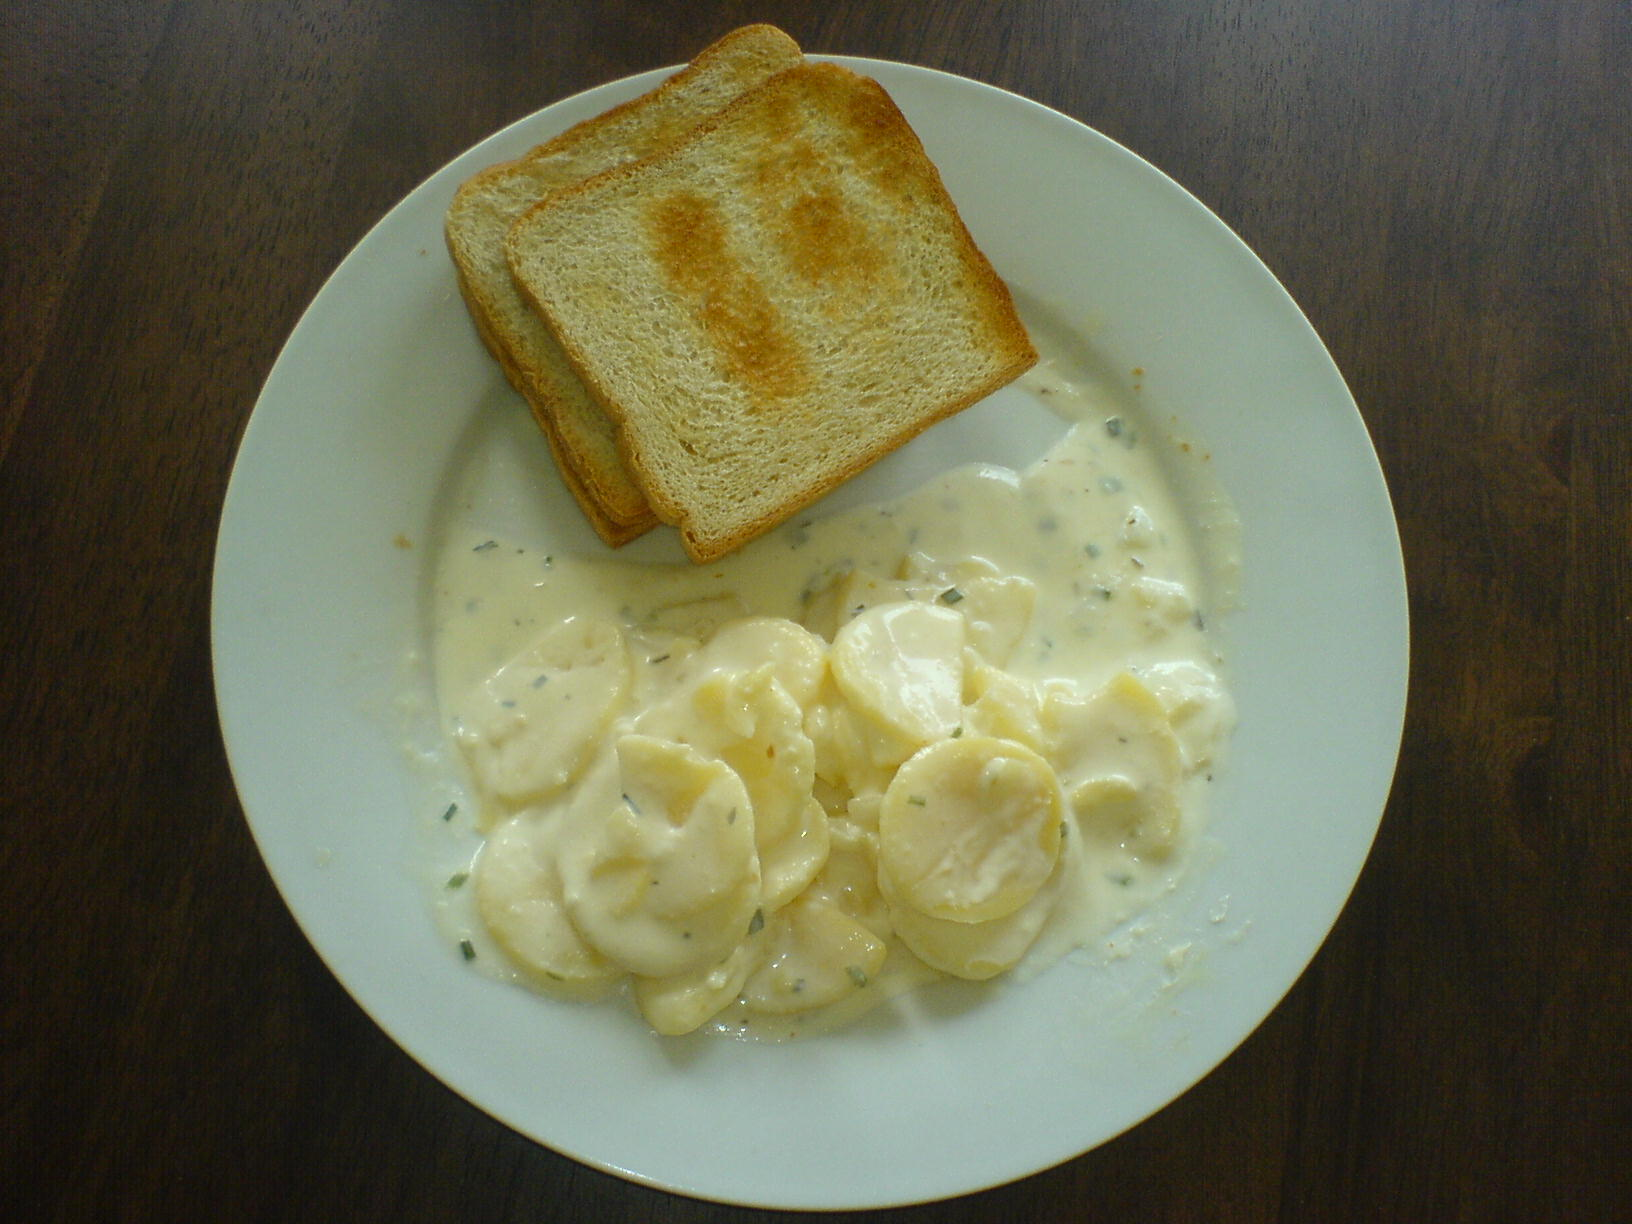 http://foodloader.net/Holz_2010-08-22_Kartoffelsalat_mit_Toasts.jpg